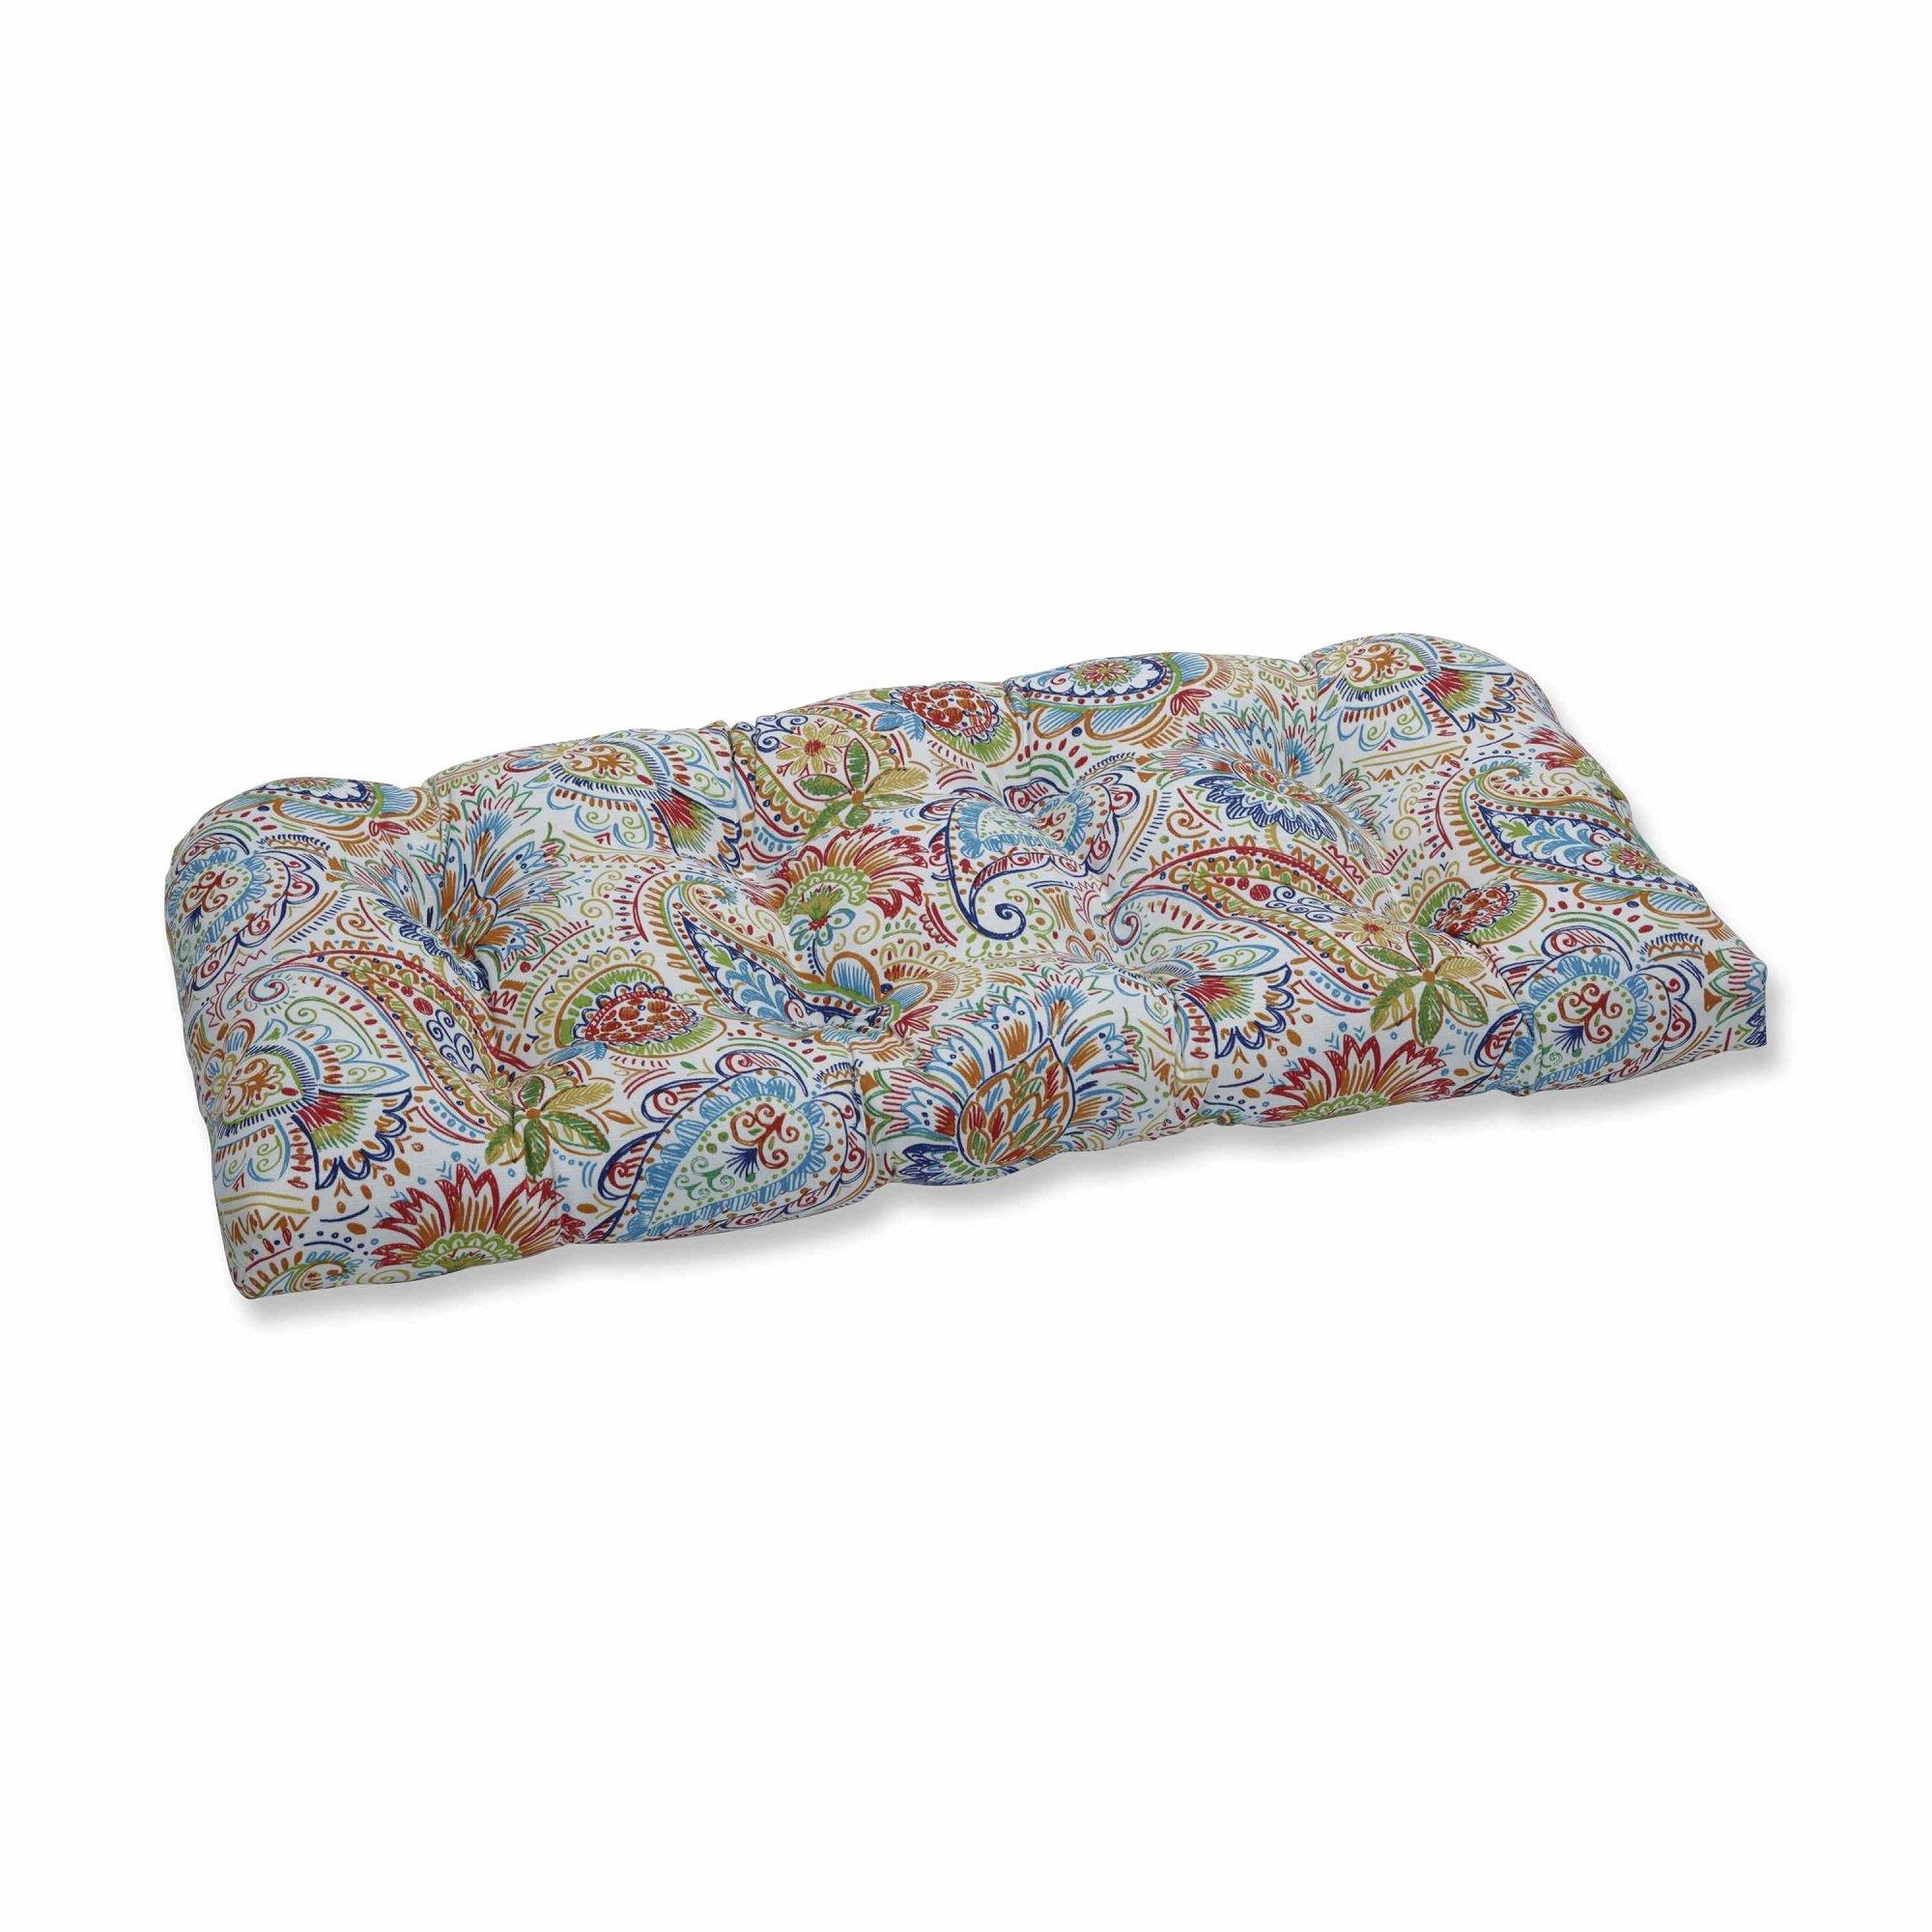 OKSLO Gilford festival wicker loveseat cushion